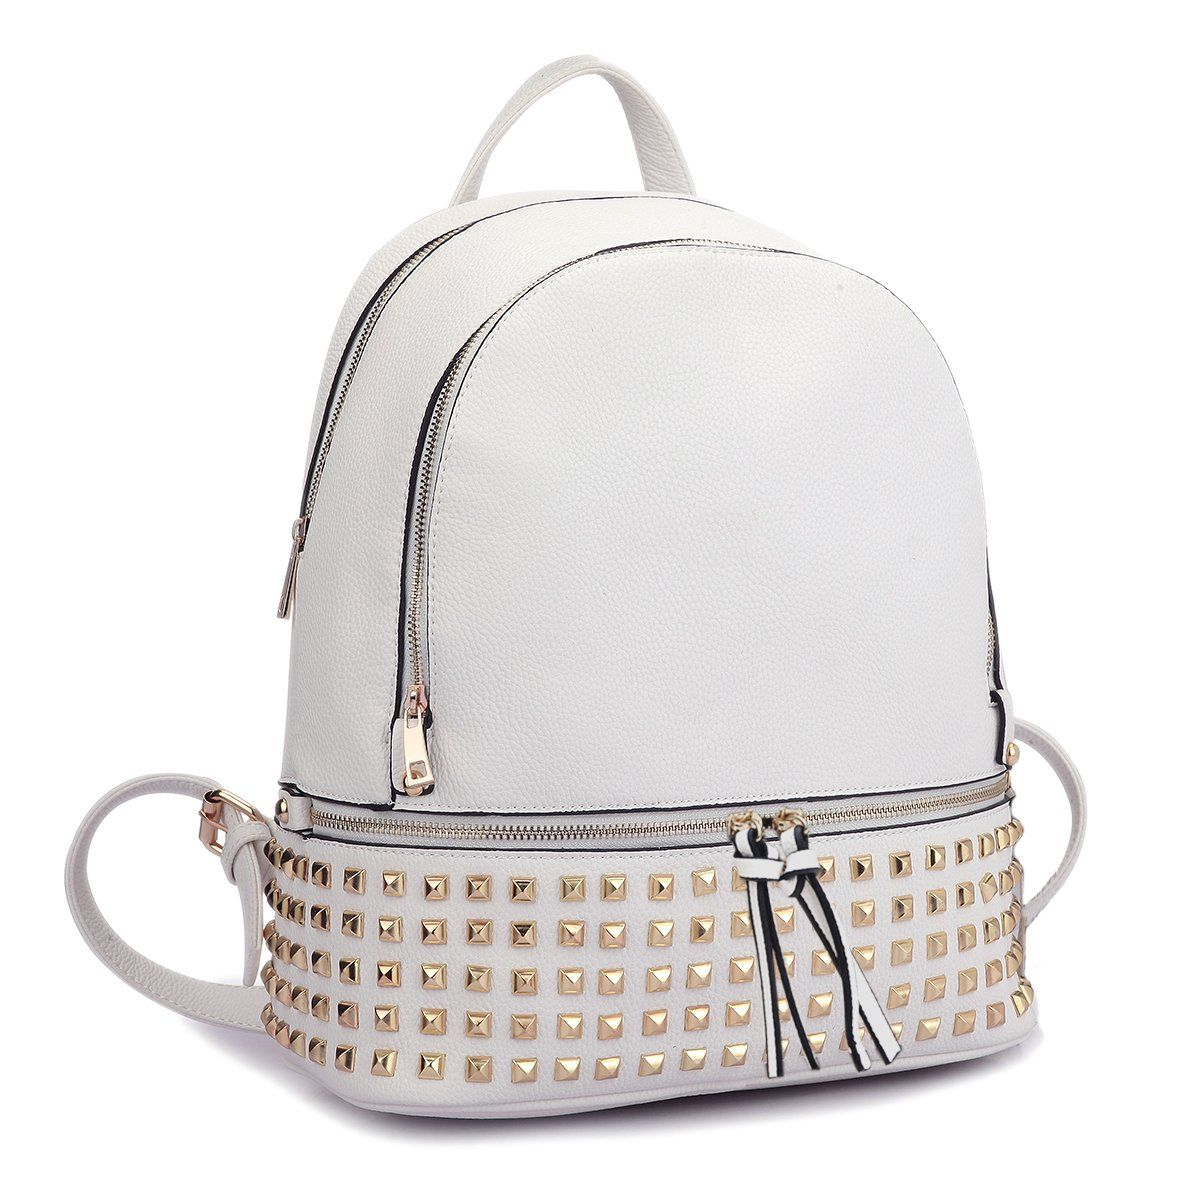 Dasein Casual Backpack Purse School Bag Vegan Leather Shoulder Bag Designer  Daypack Tote for Womens   abecf68cf5